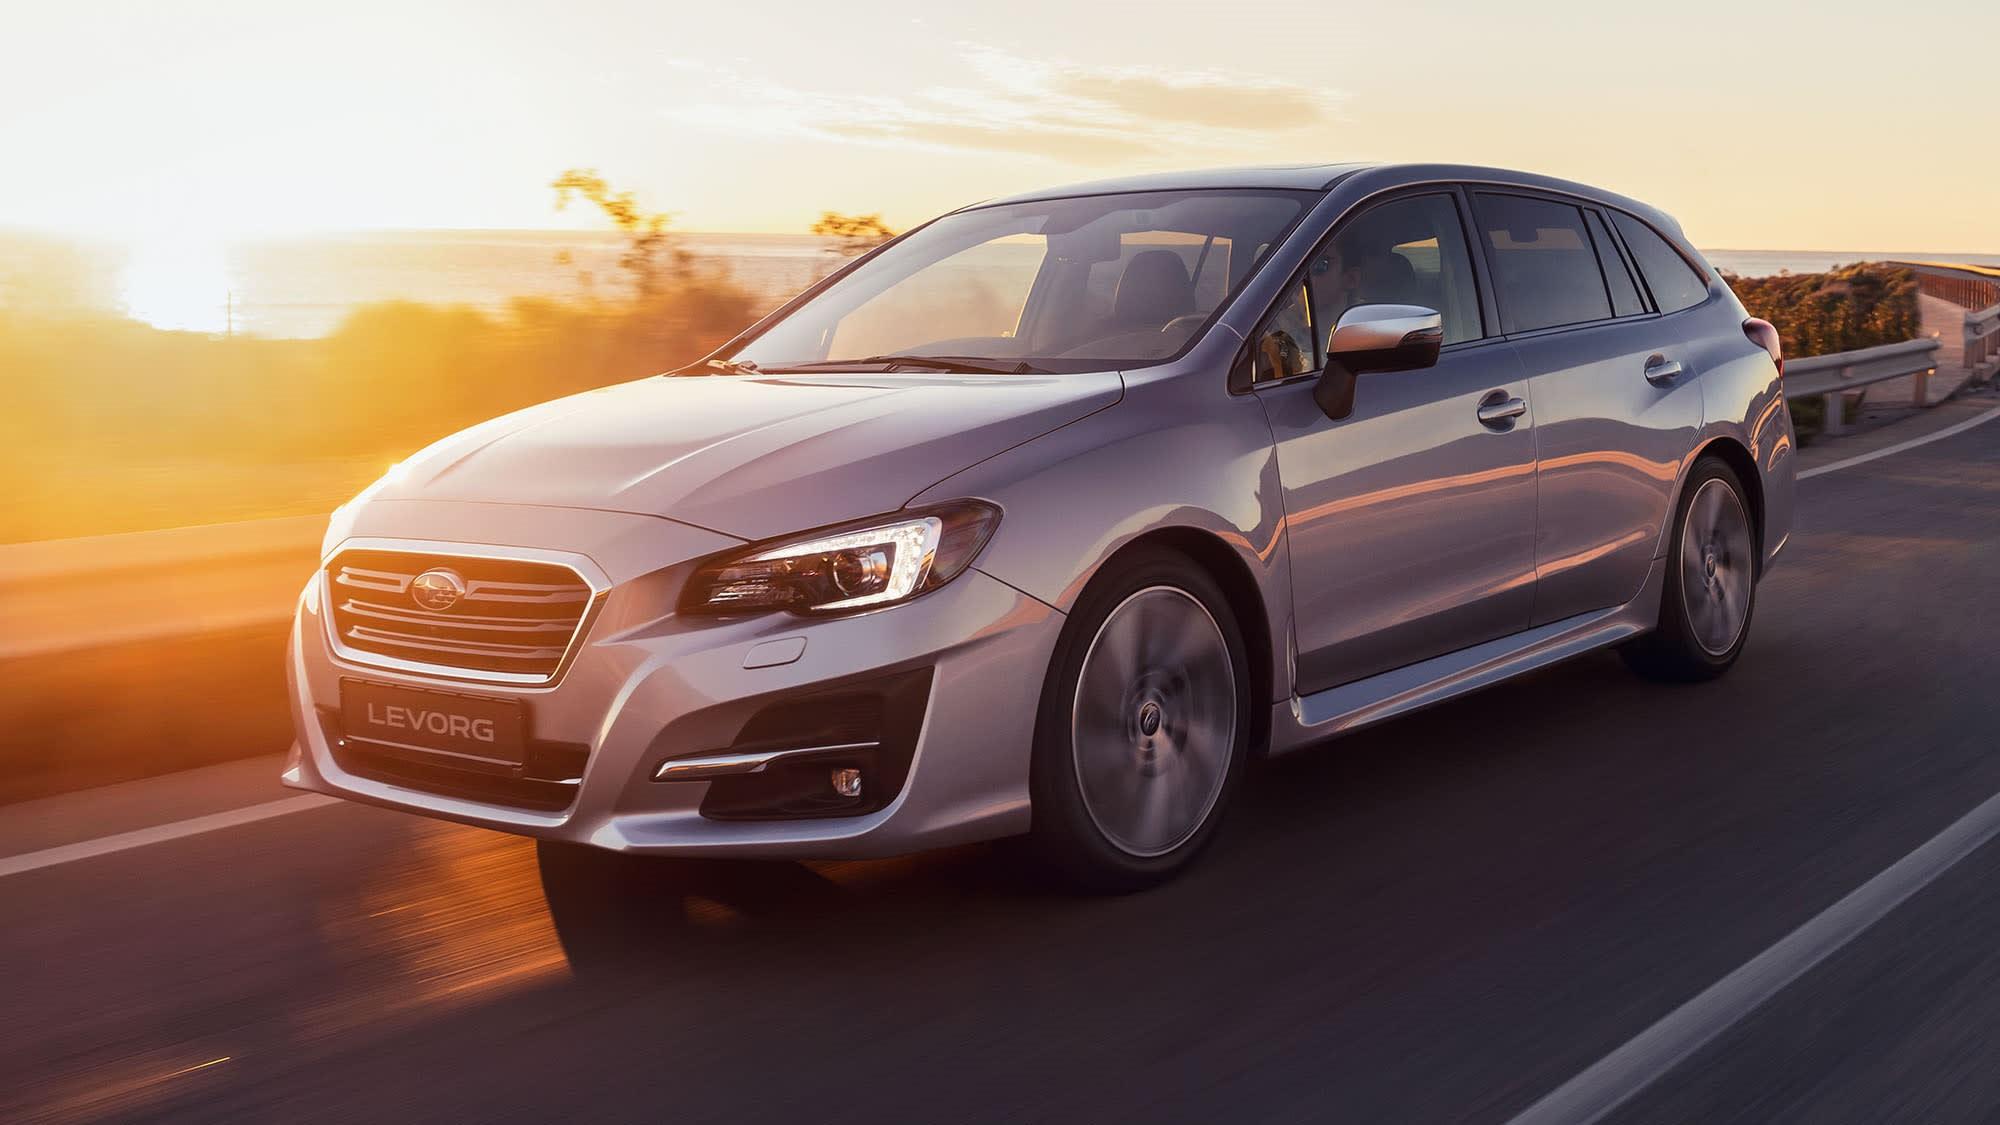 2019 Subaru Levorg gets 2.0L atmo four in the UK